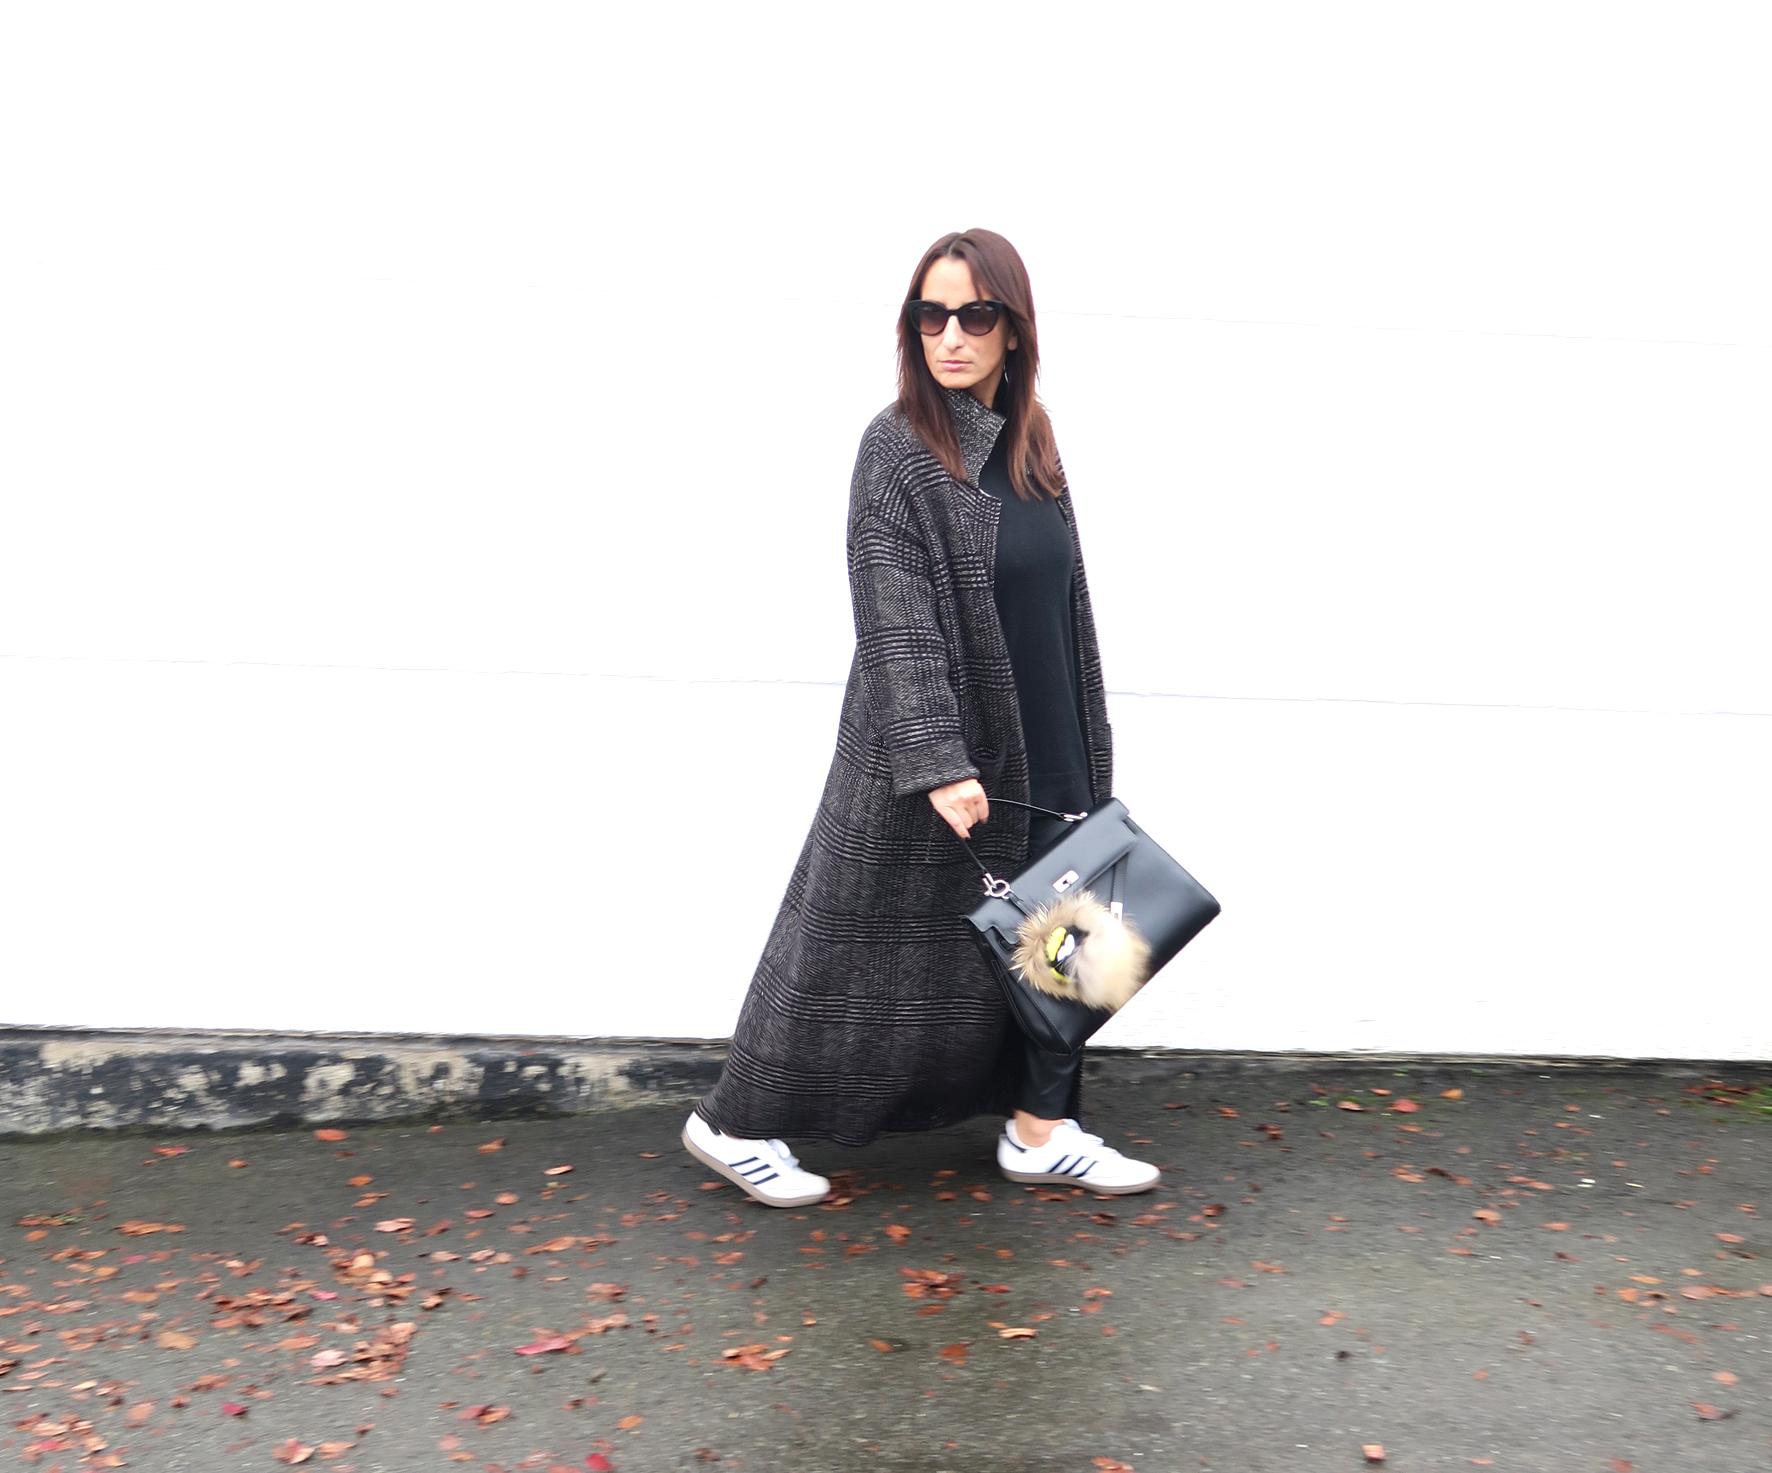 streetstyle-tartan-coat-zara-style-blogger-fendi-bag-4